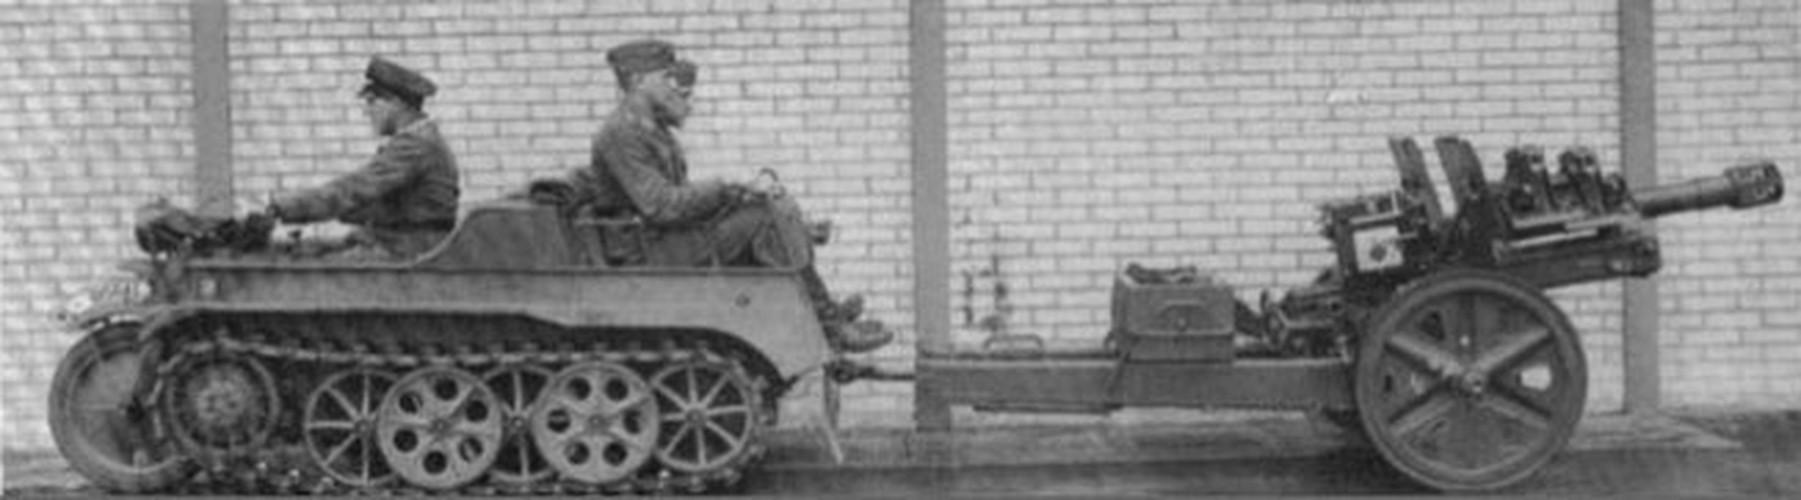 Cuc ngau xe may chien truong Sdkfz 2 cua Duc trong CTTG2-Hinh-2